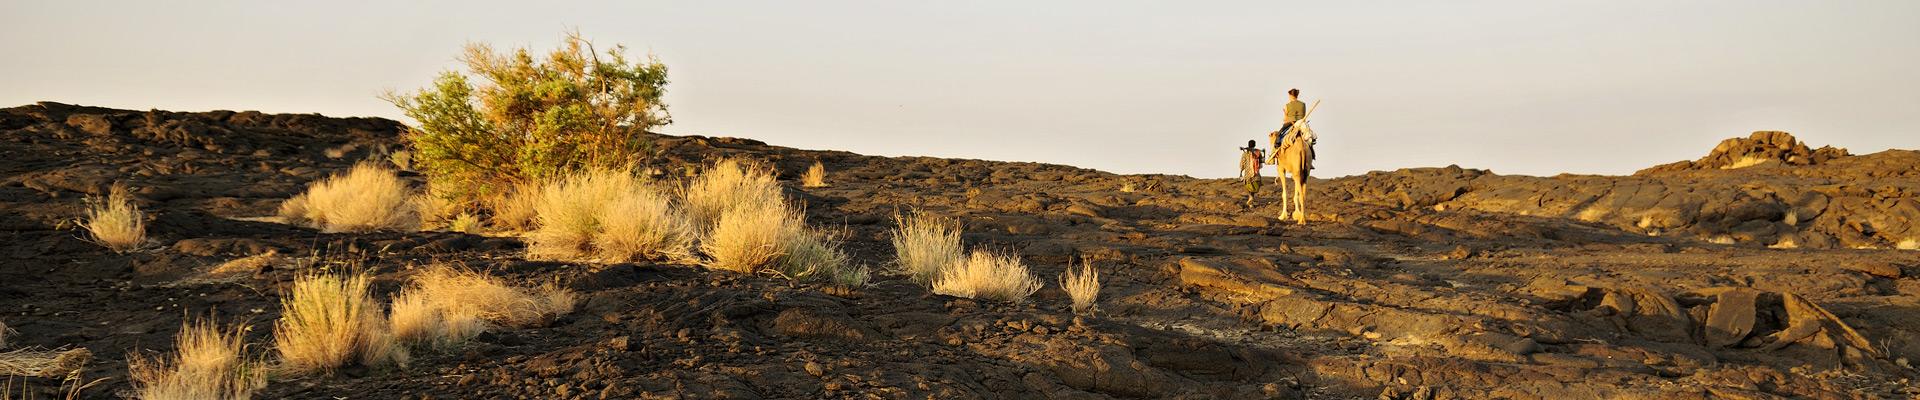 Top image sur le volcan Erta Ale, Ethiopie